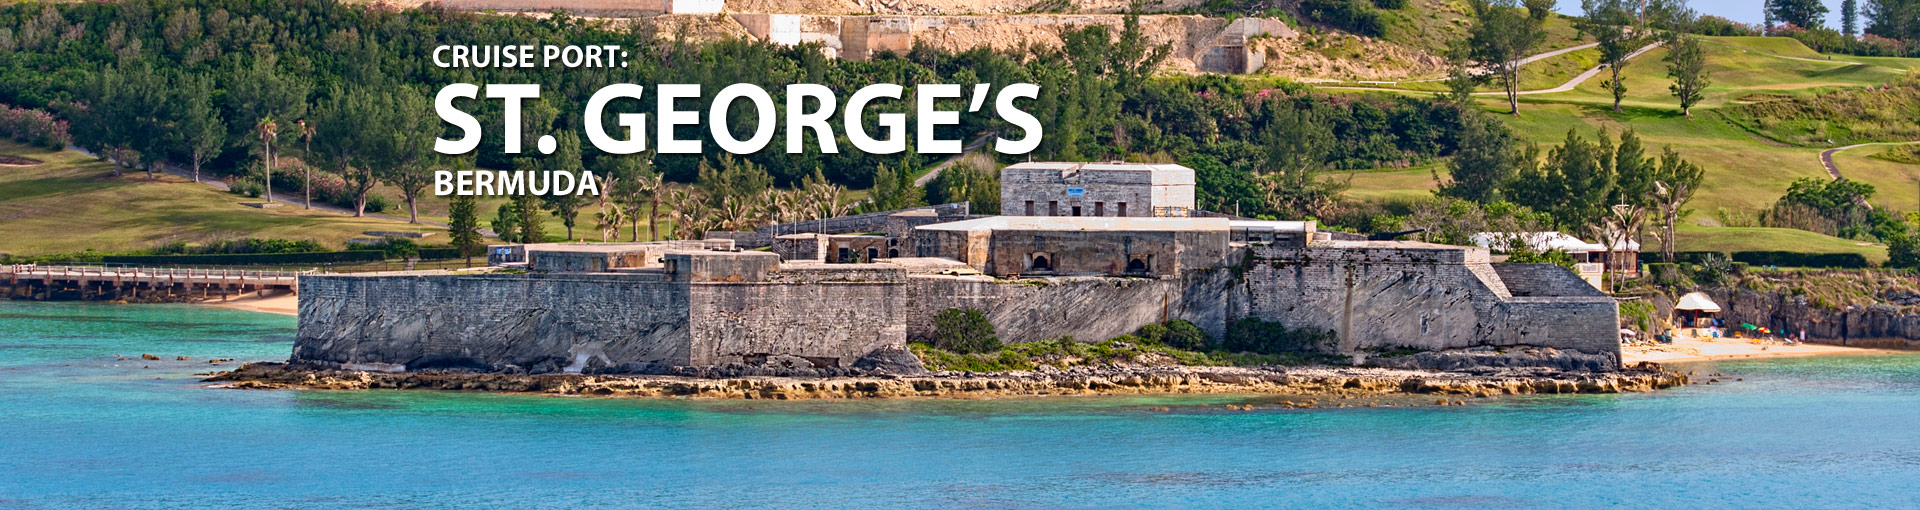 Cruises to St. George, Bermuda